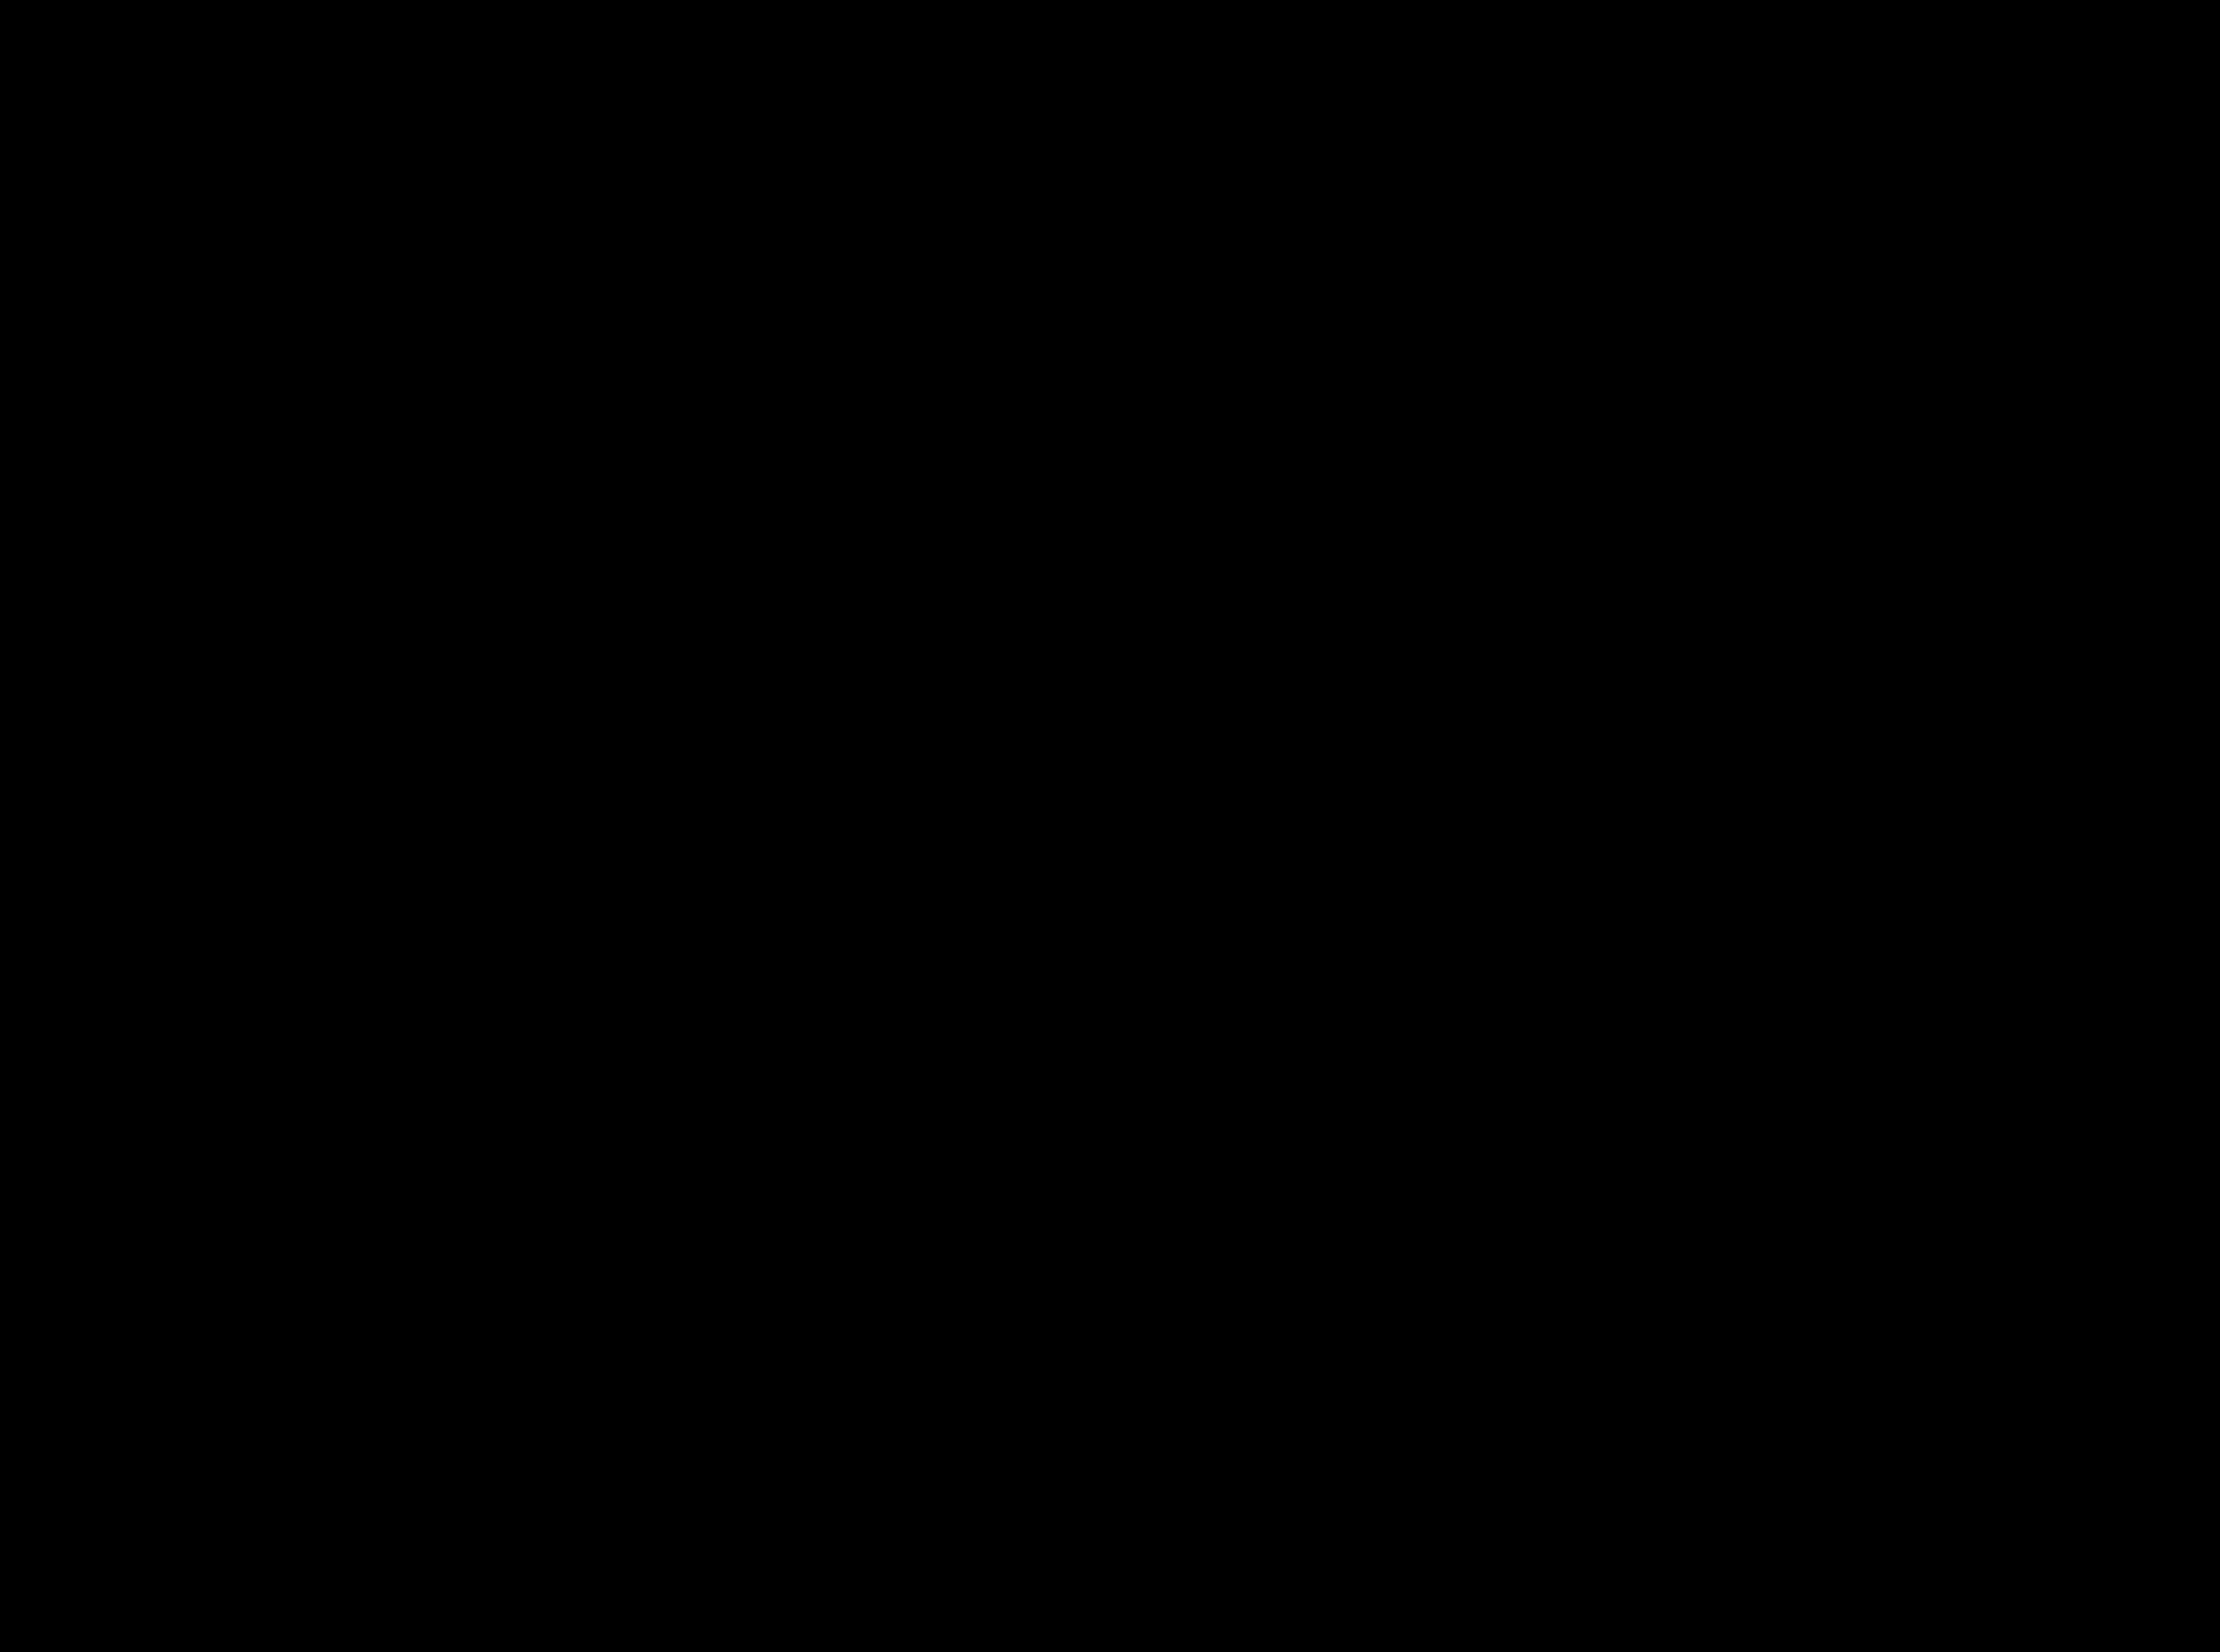 Roxy student discounts logo